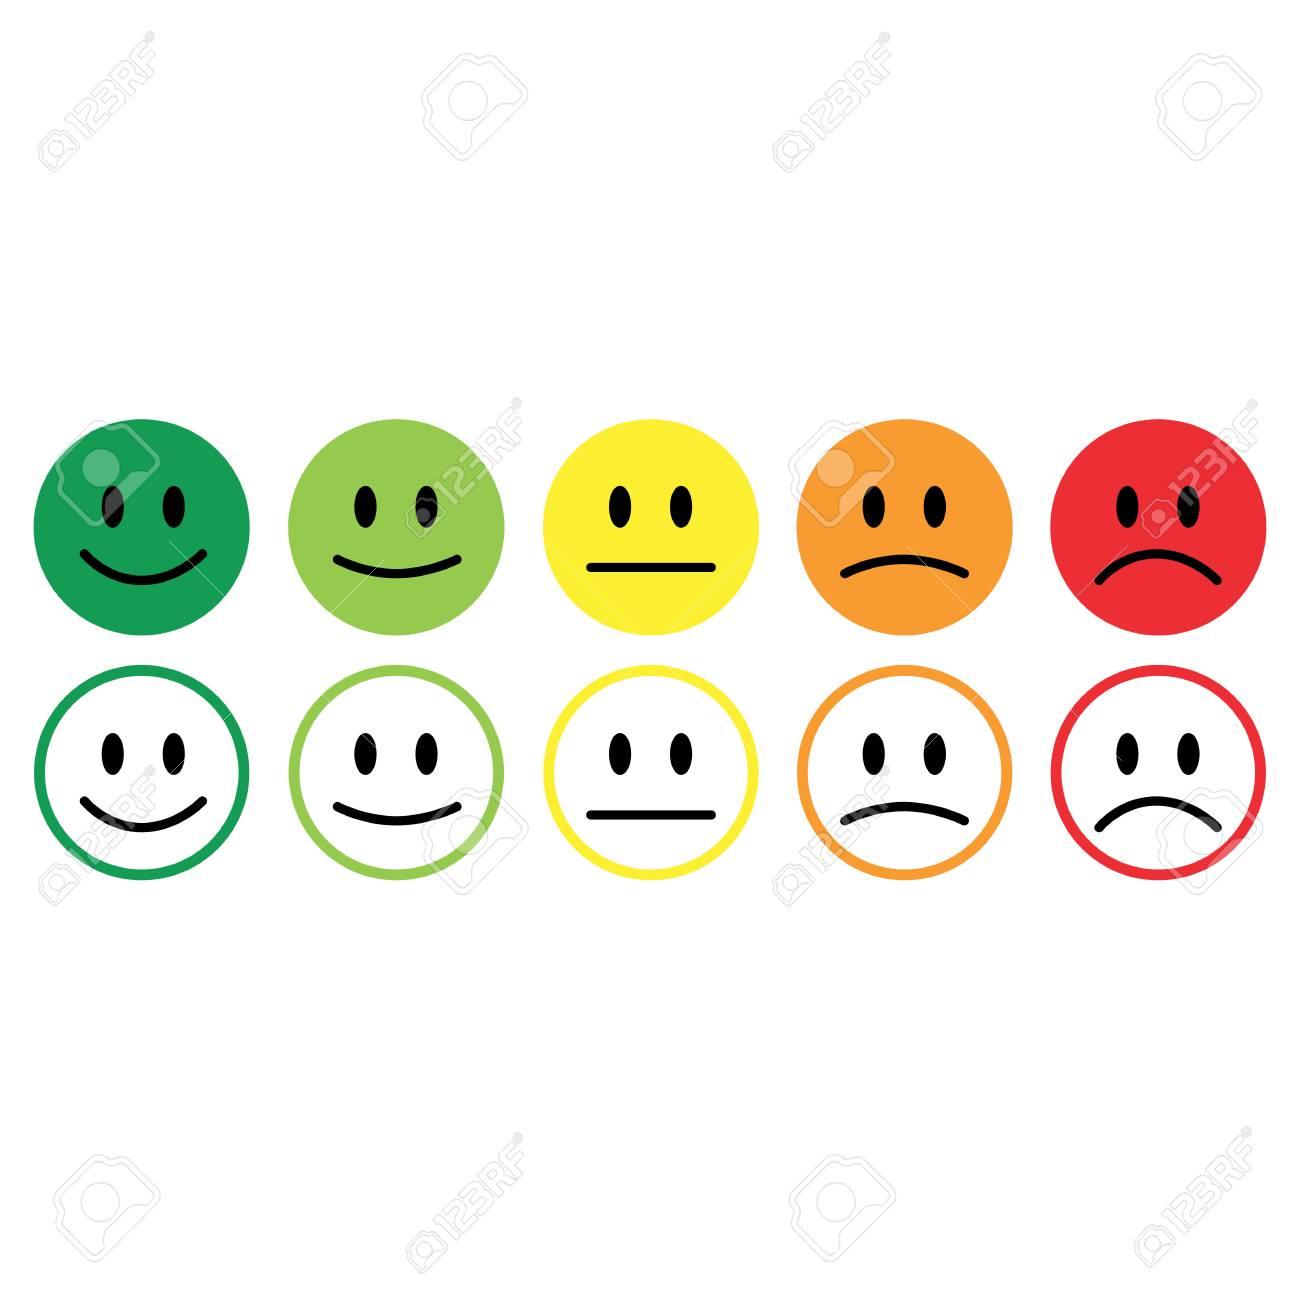 Five smile icon emotions satisfaction rating feedback vector. - 96867983